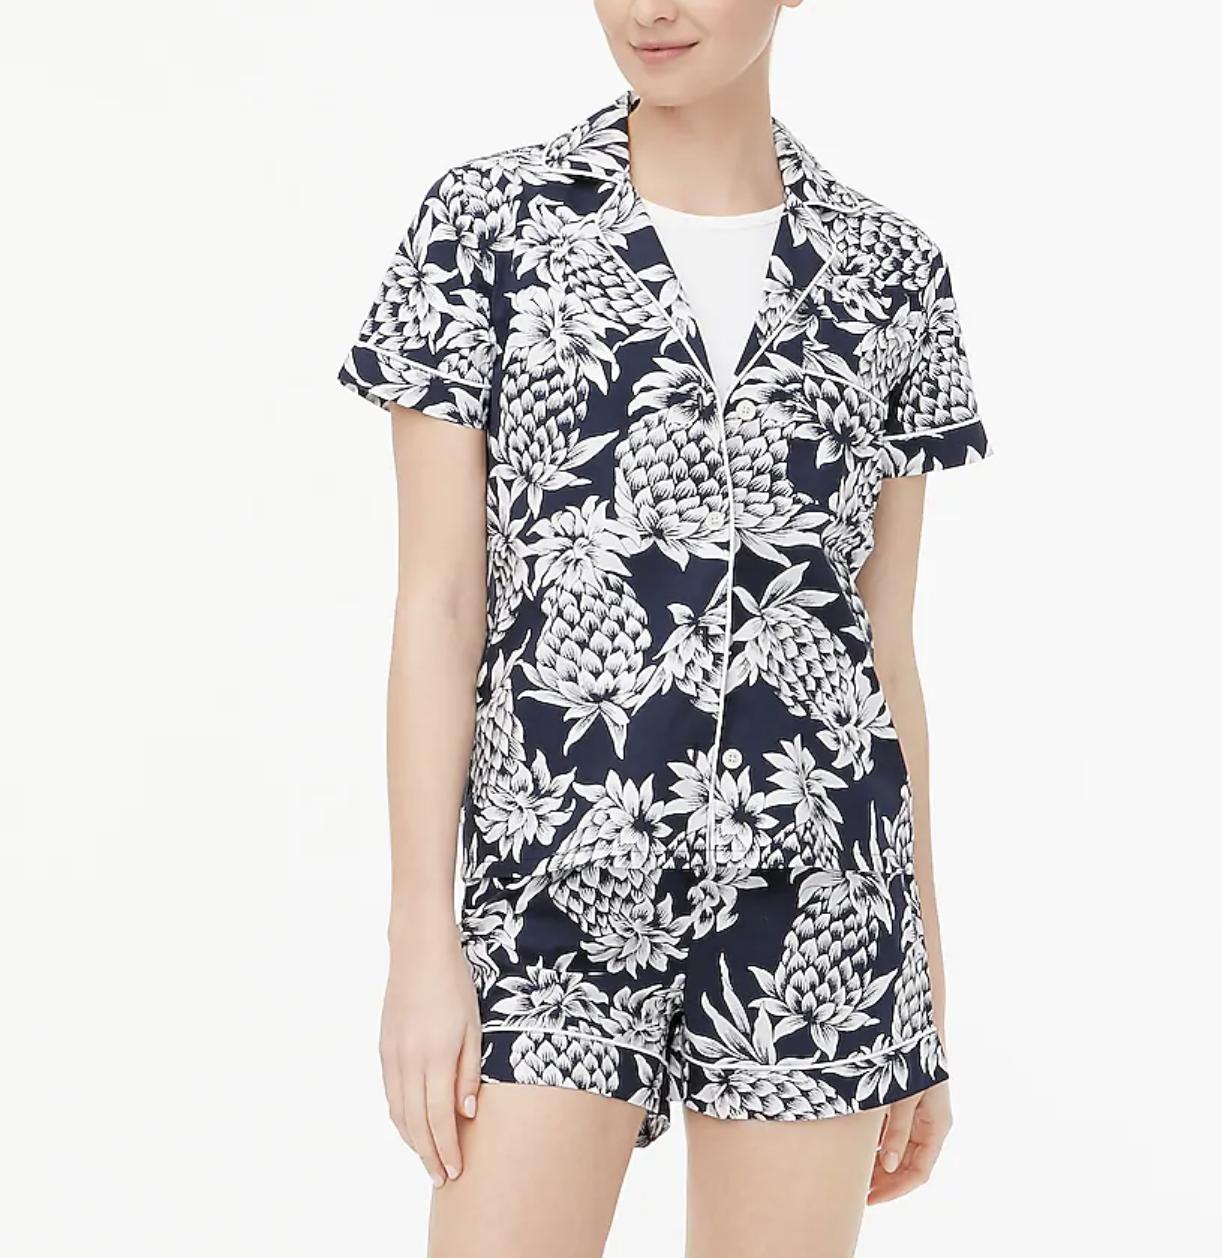 A model wears short-sleeve pajama set in a pineapple print